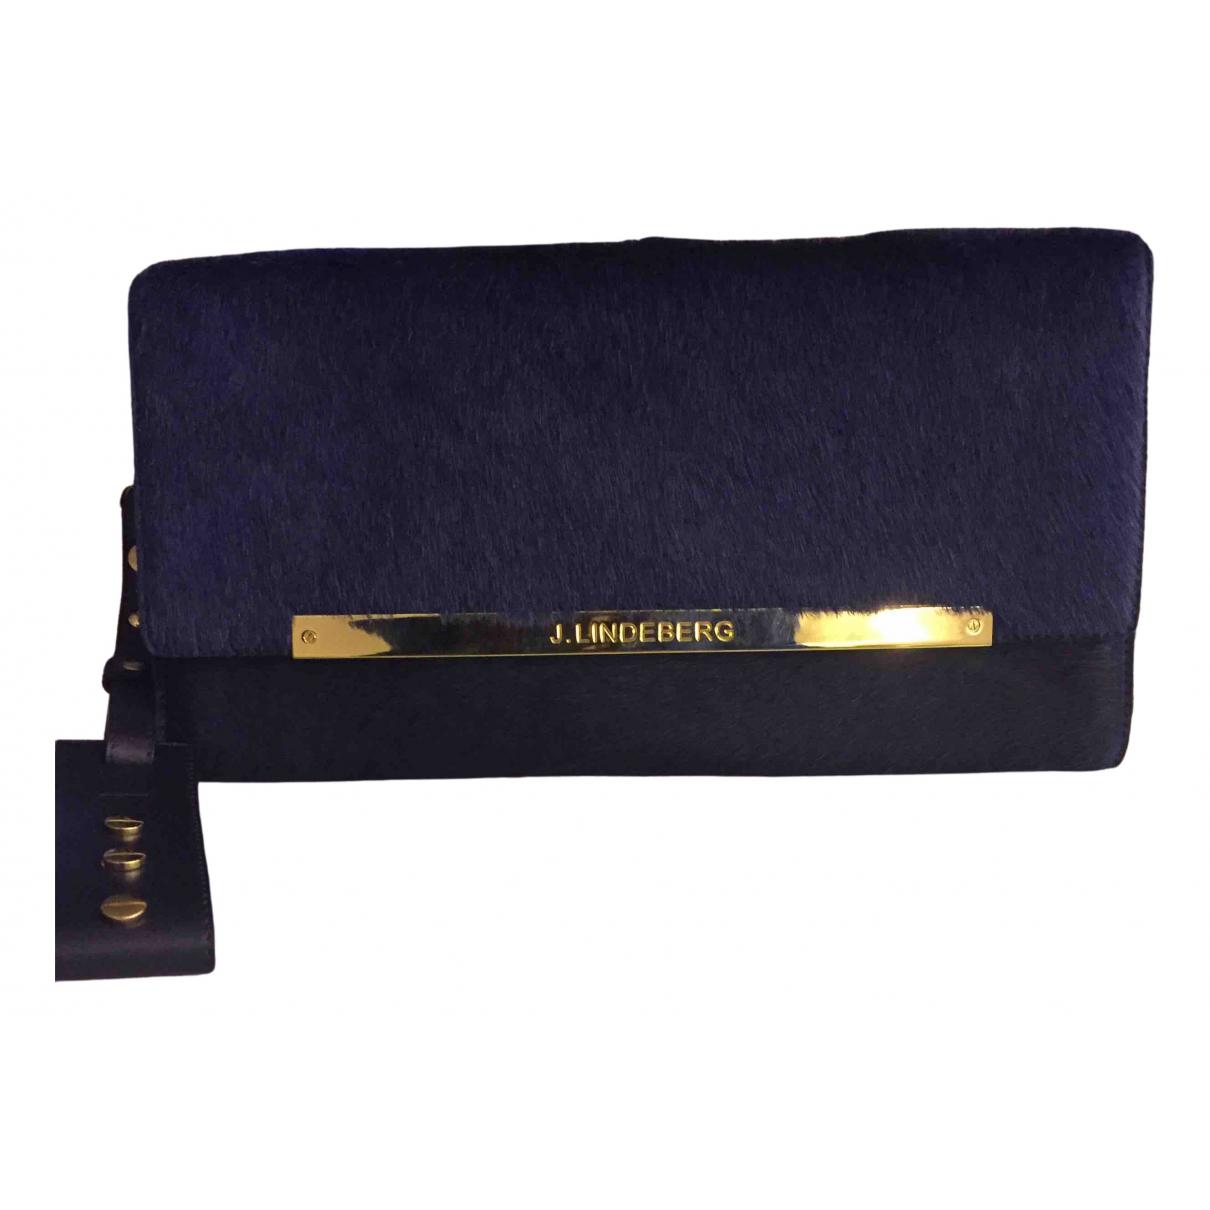 J.lindeberg \N Blue Cloth Clutch bag for Women \N